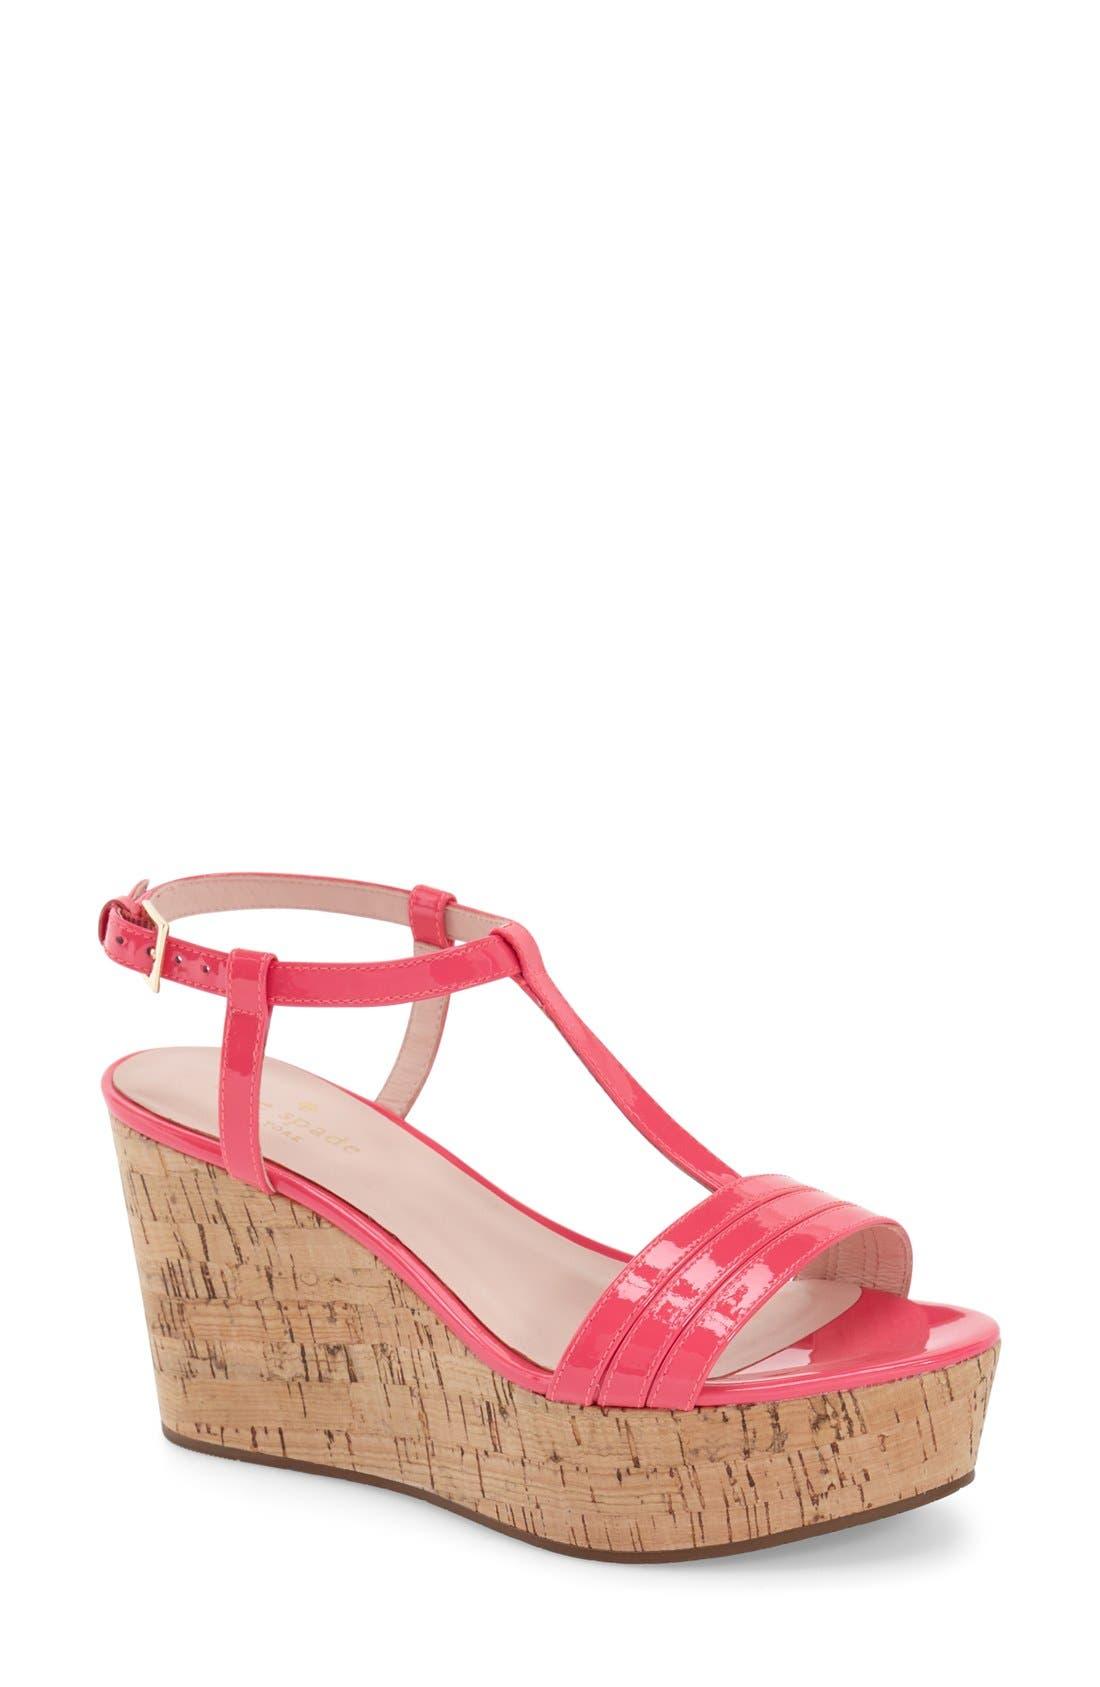 Alternate Image 1 Selected - kate spade new york 'tallin' wedge sandal (Women)